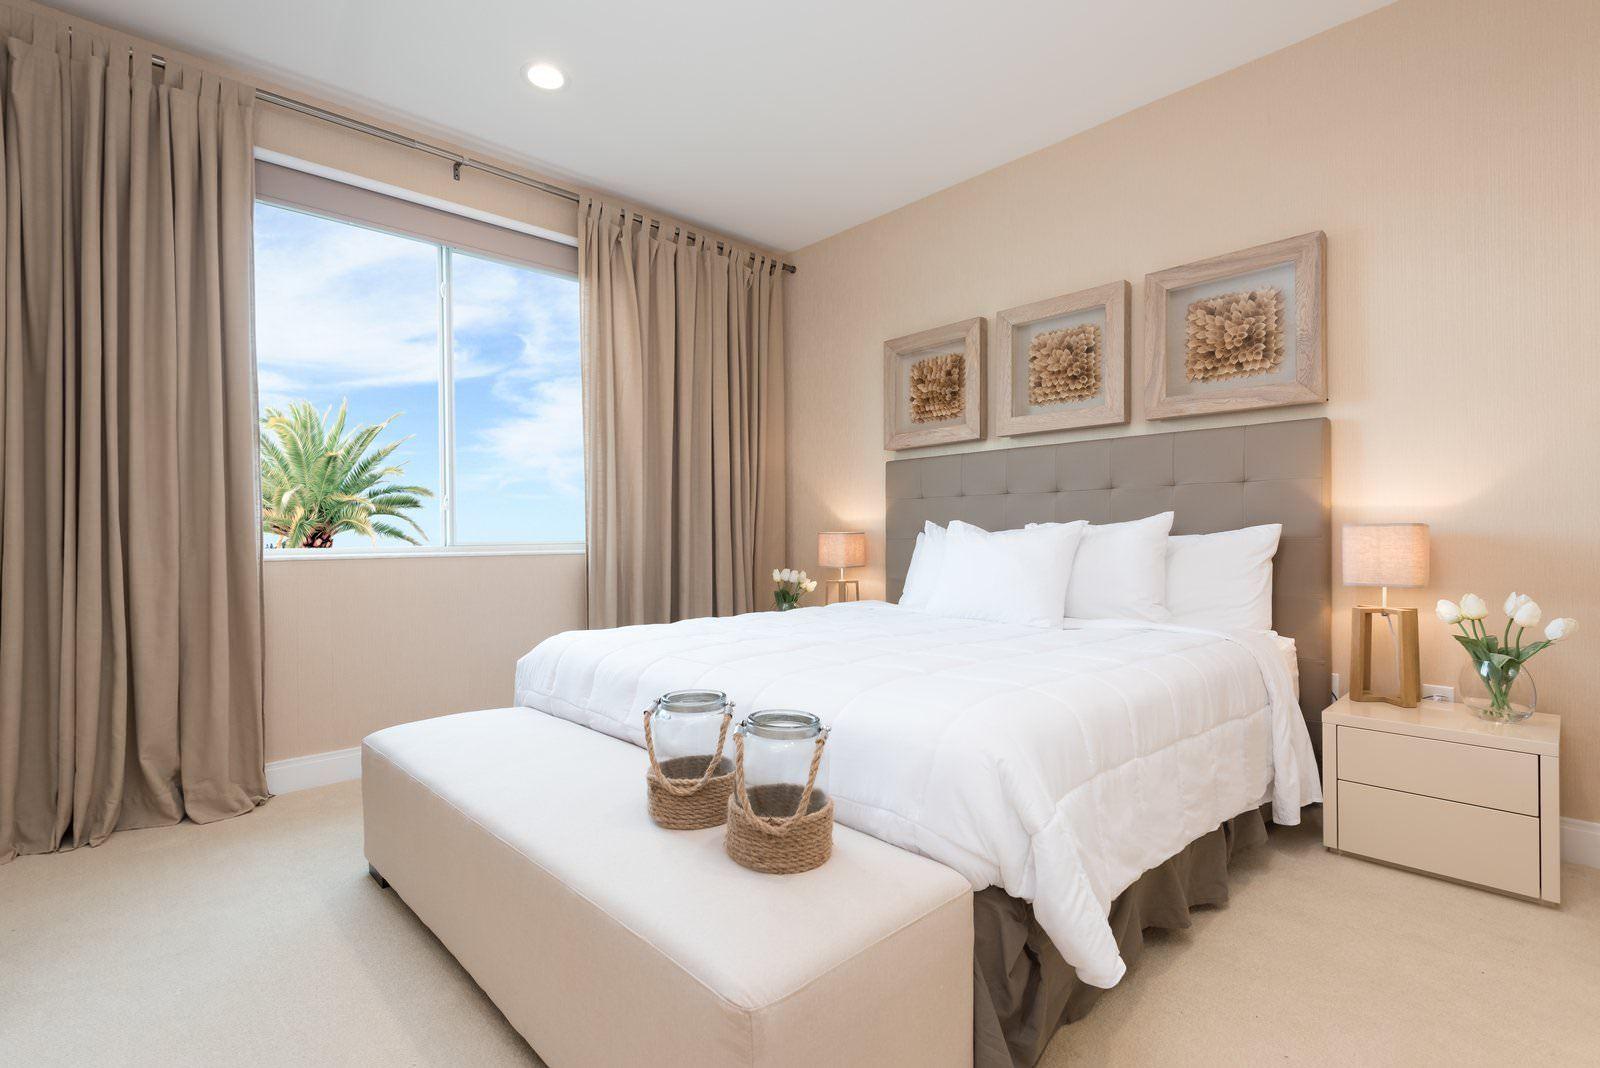 Magic-Village-Bedroom-View